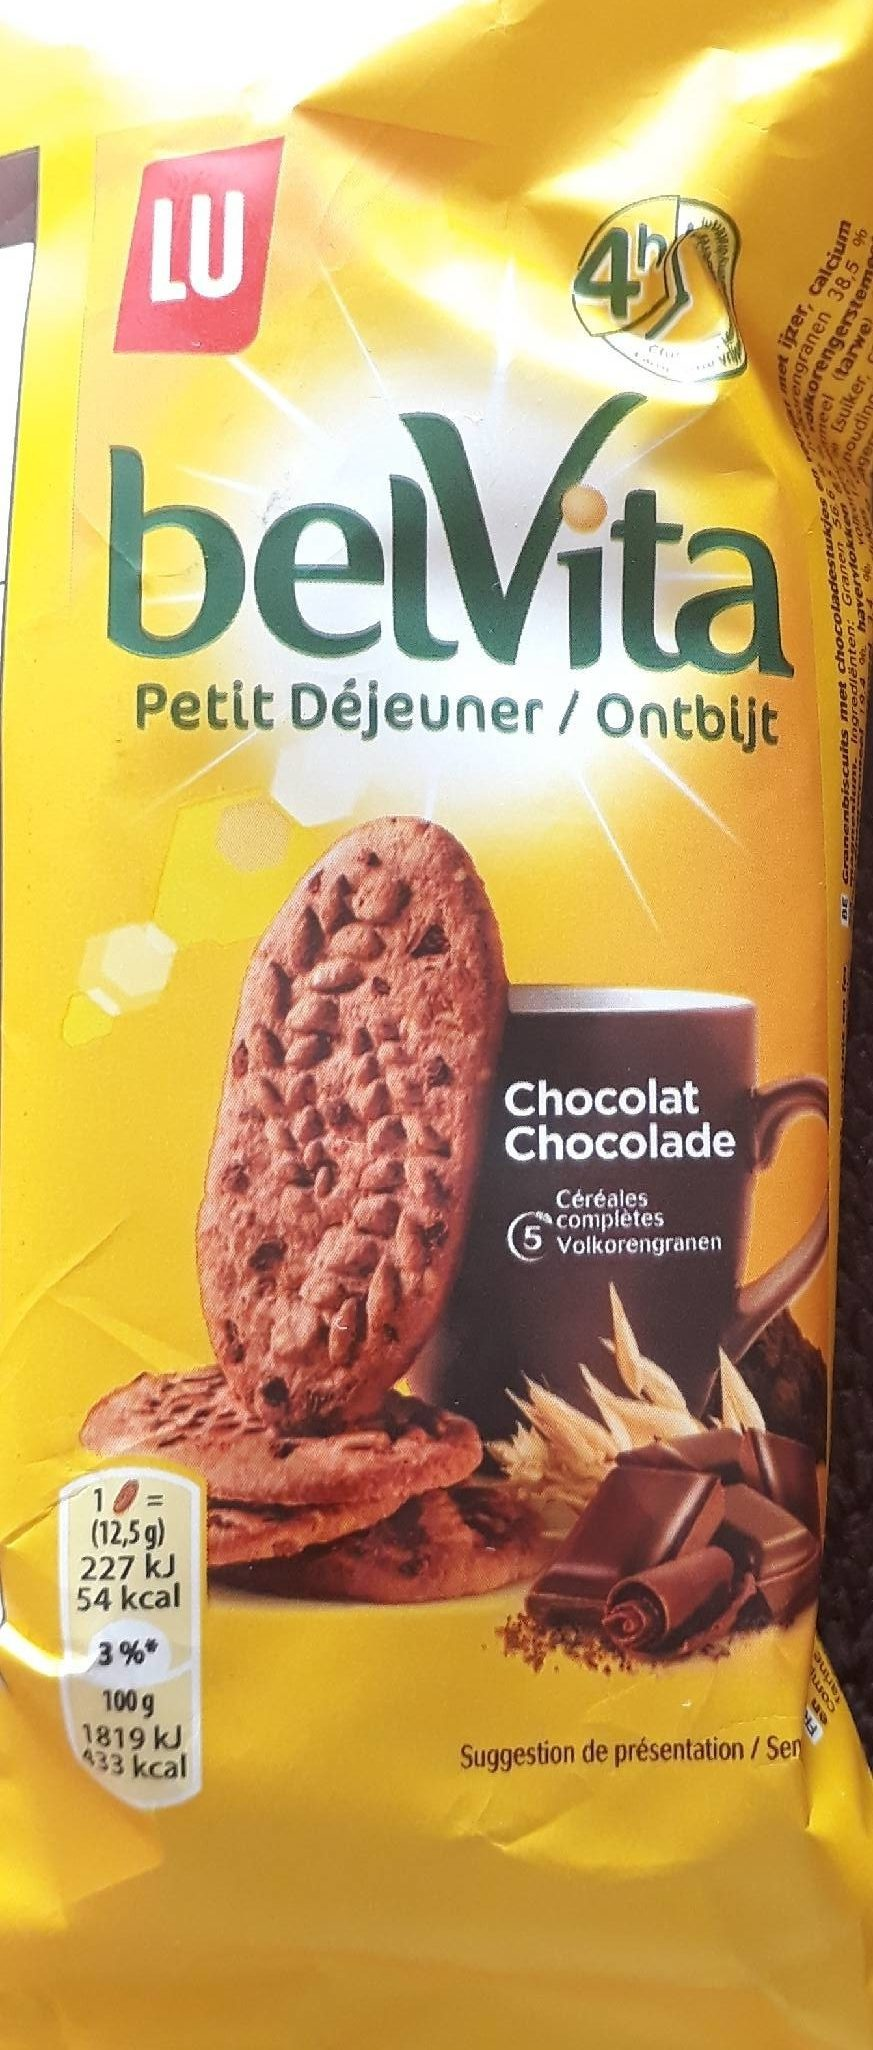 Petit déjeuner pépites chocolat - Product